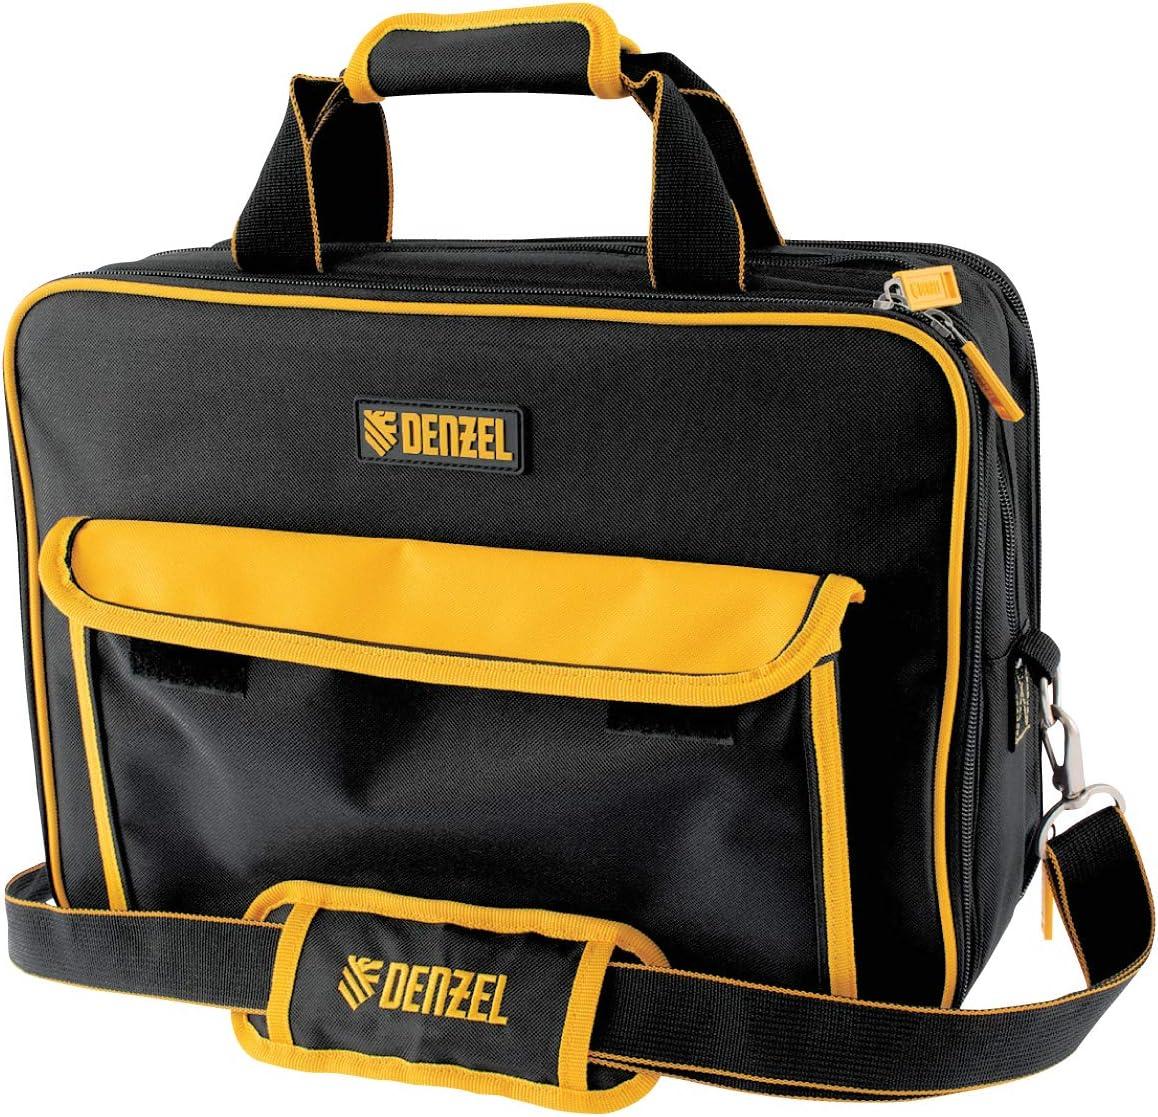 DENZEL Tools bags Sturdy Bottom Plate (31 pocket tool bag) (7790